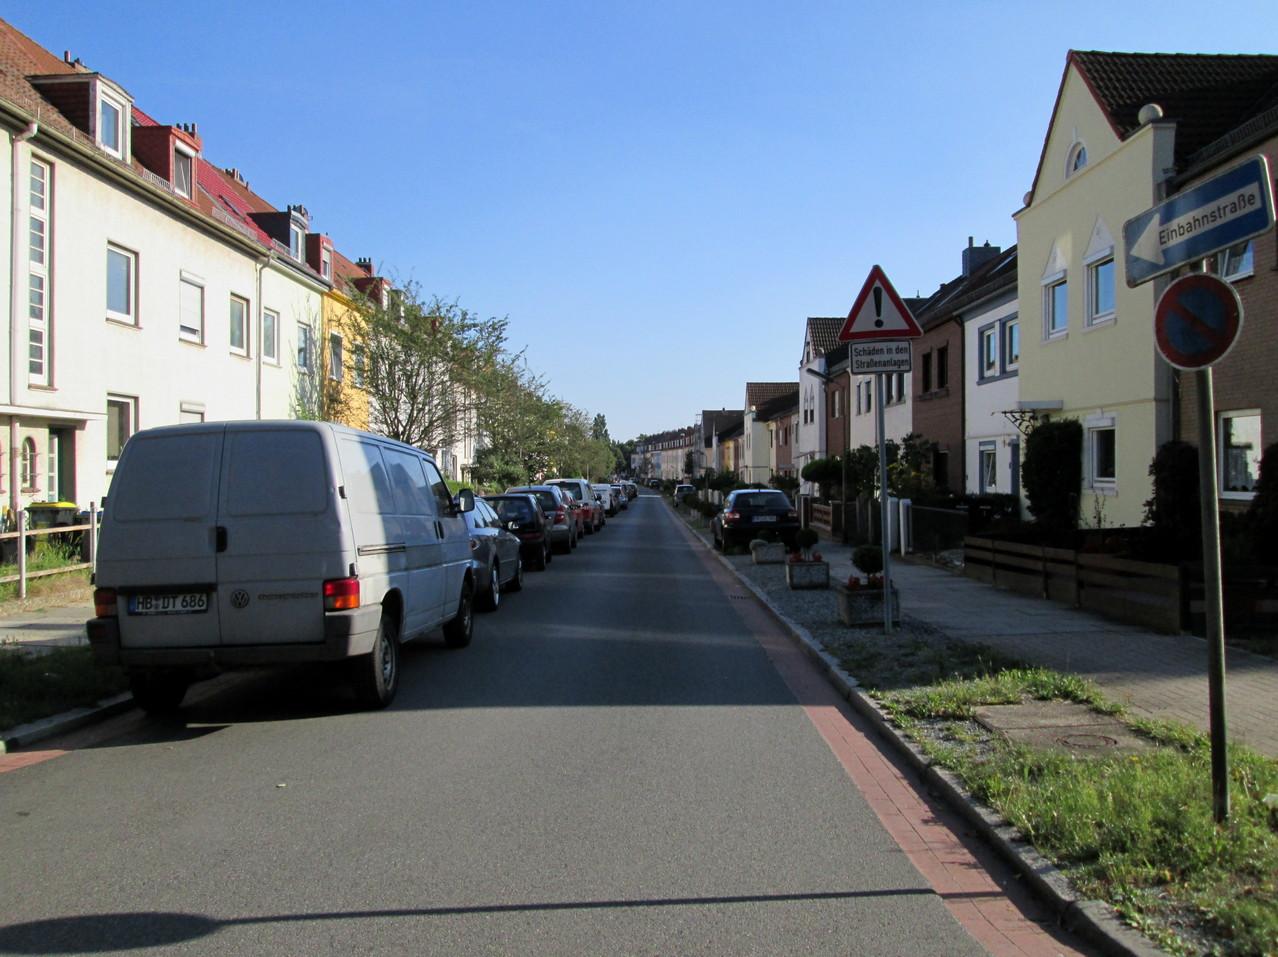 Stubbener Straße